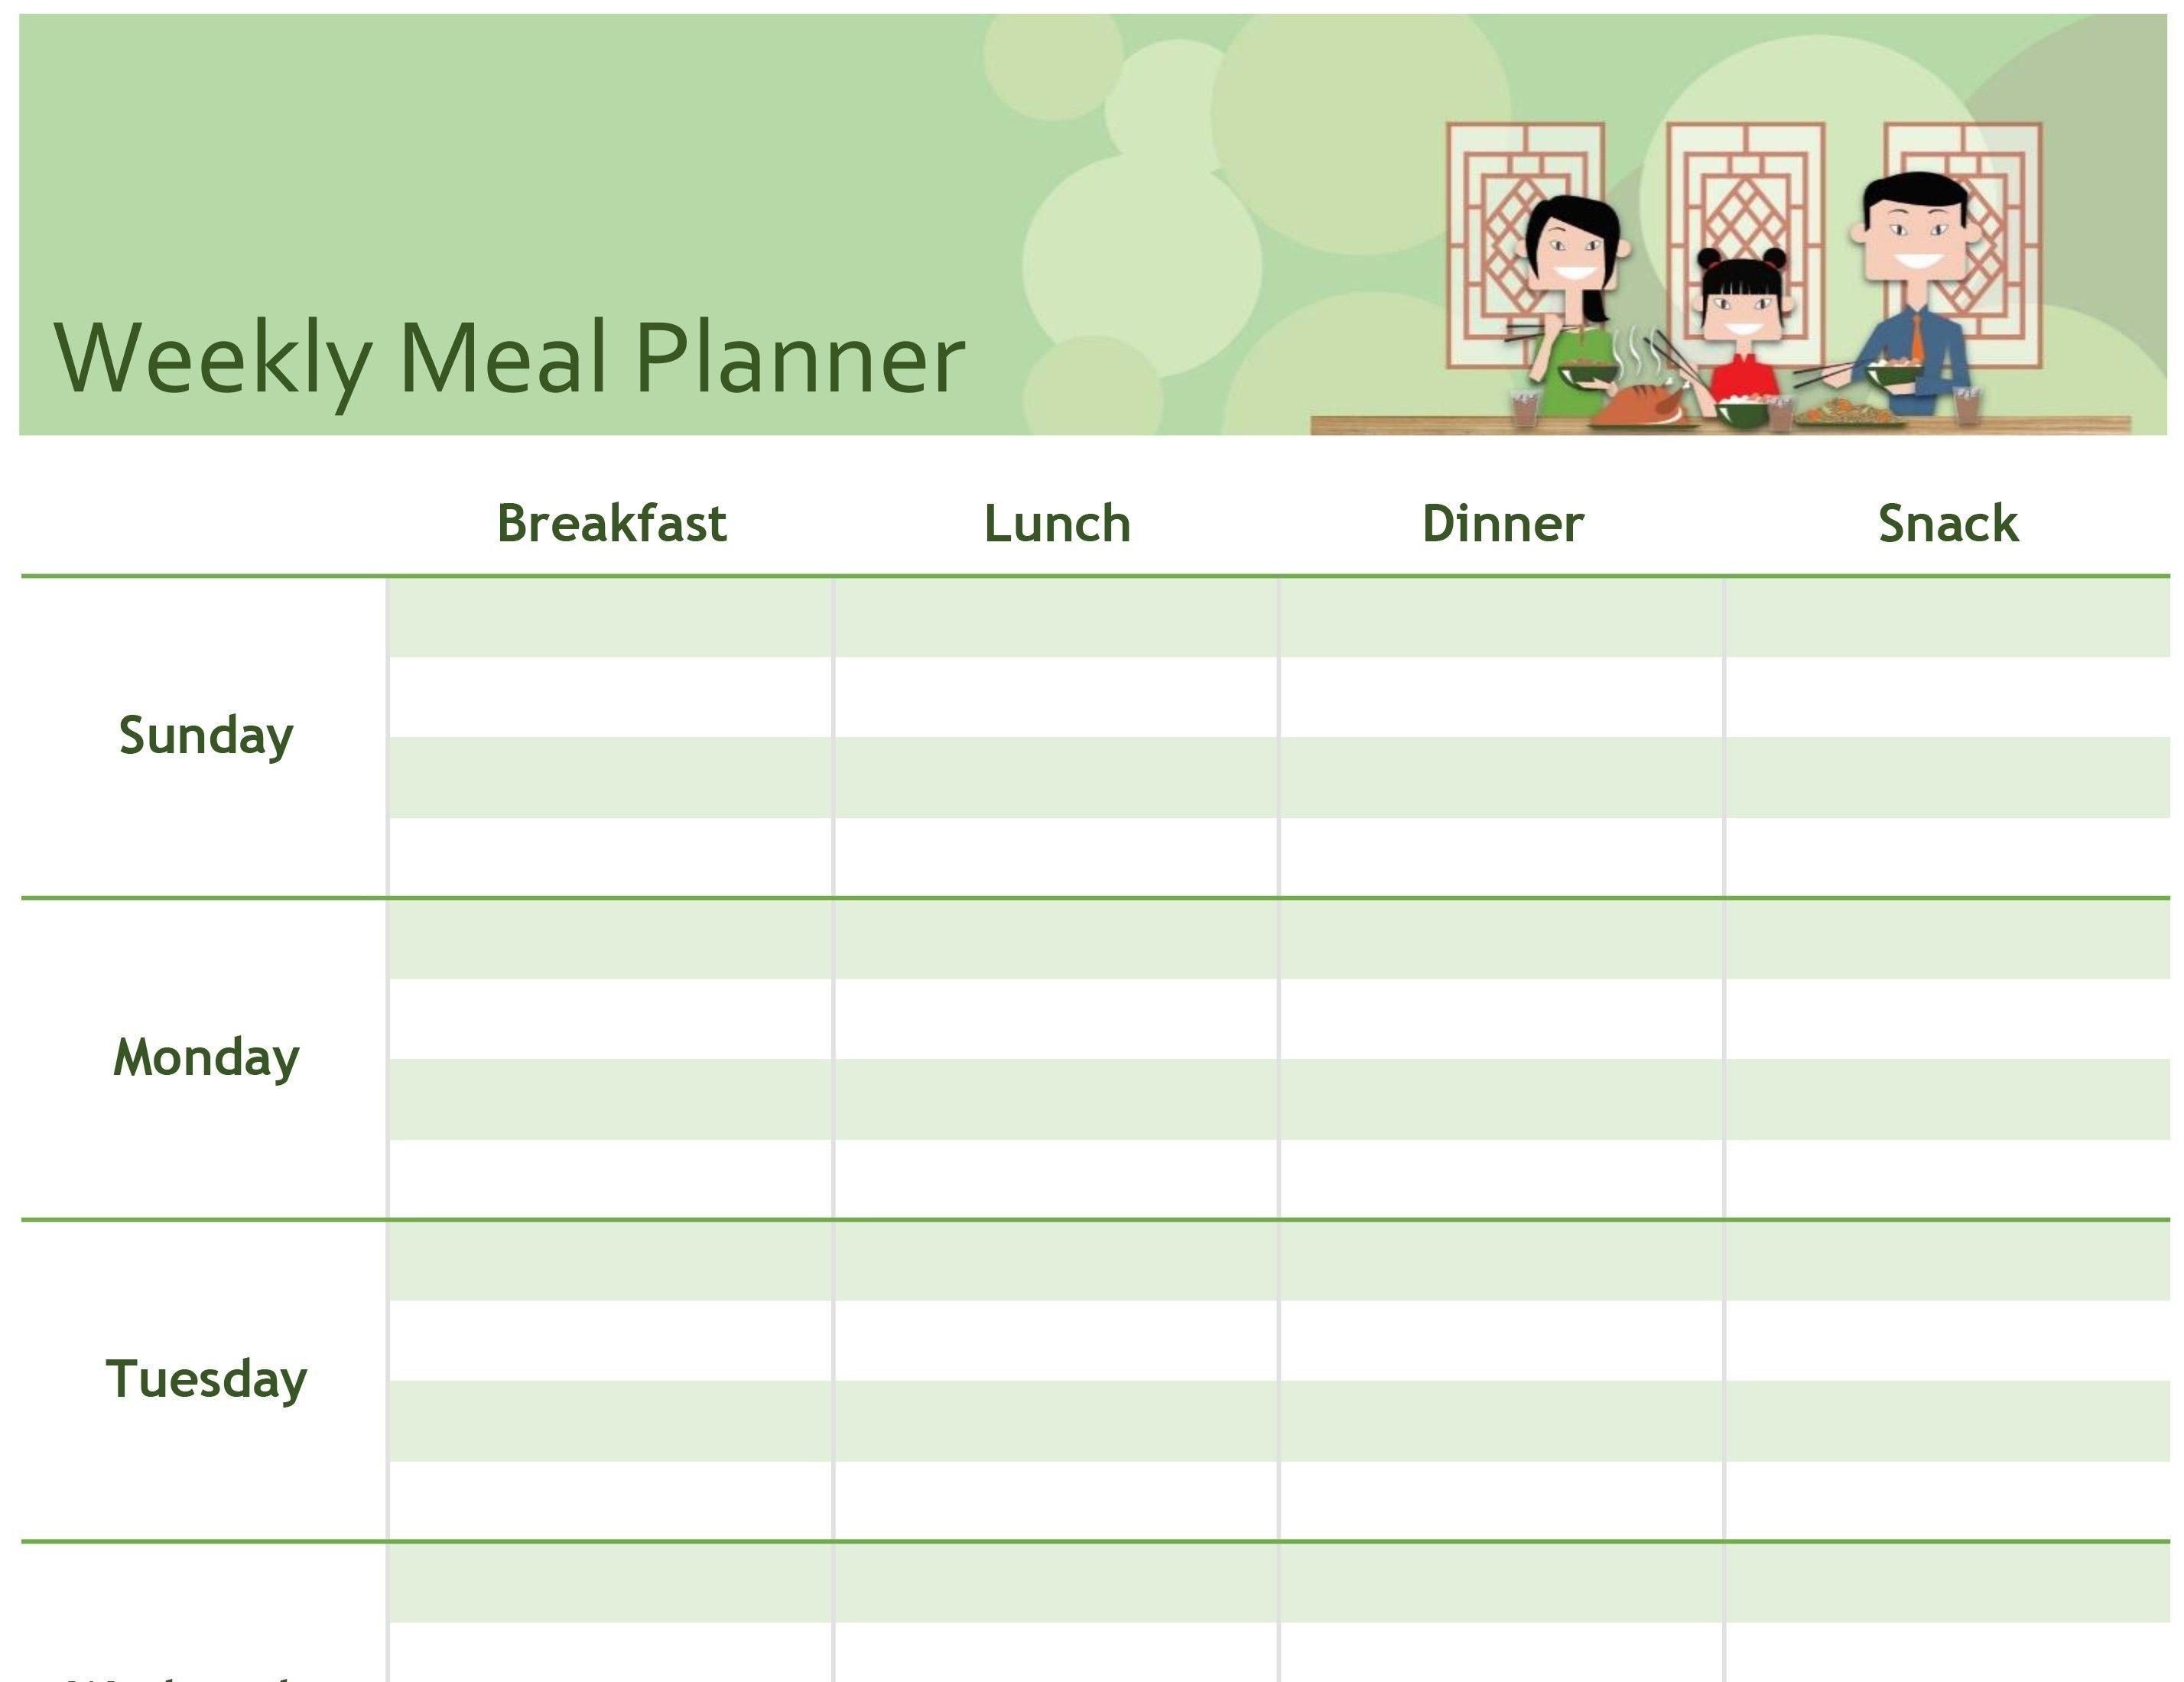 Unique Meal Planning Template Google Sheets Exceltemplate Xls Xlstemplate Xlsformat Exce Weekly Meal Plan Template Meal Planner Template Free Meal Planner